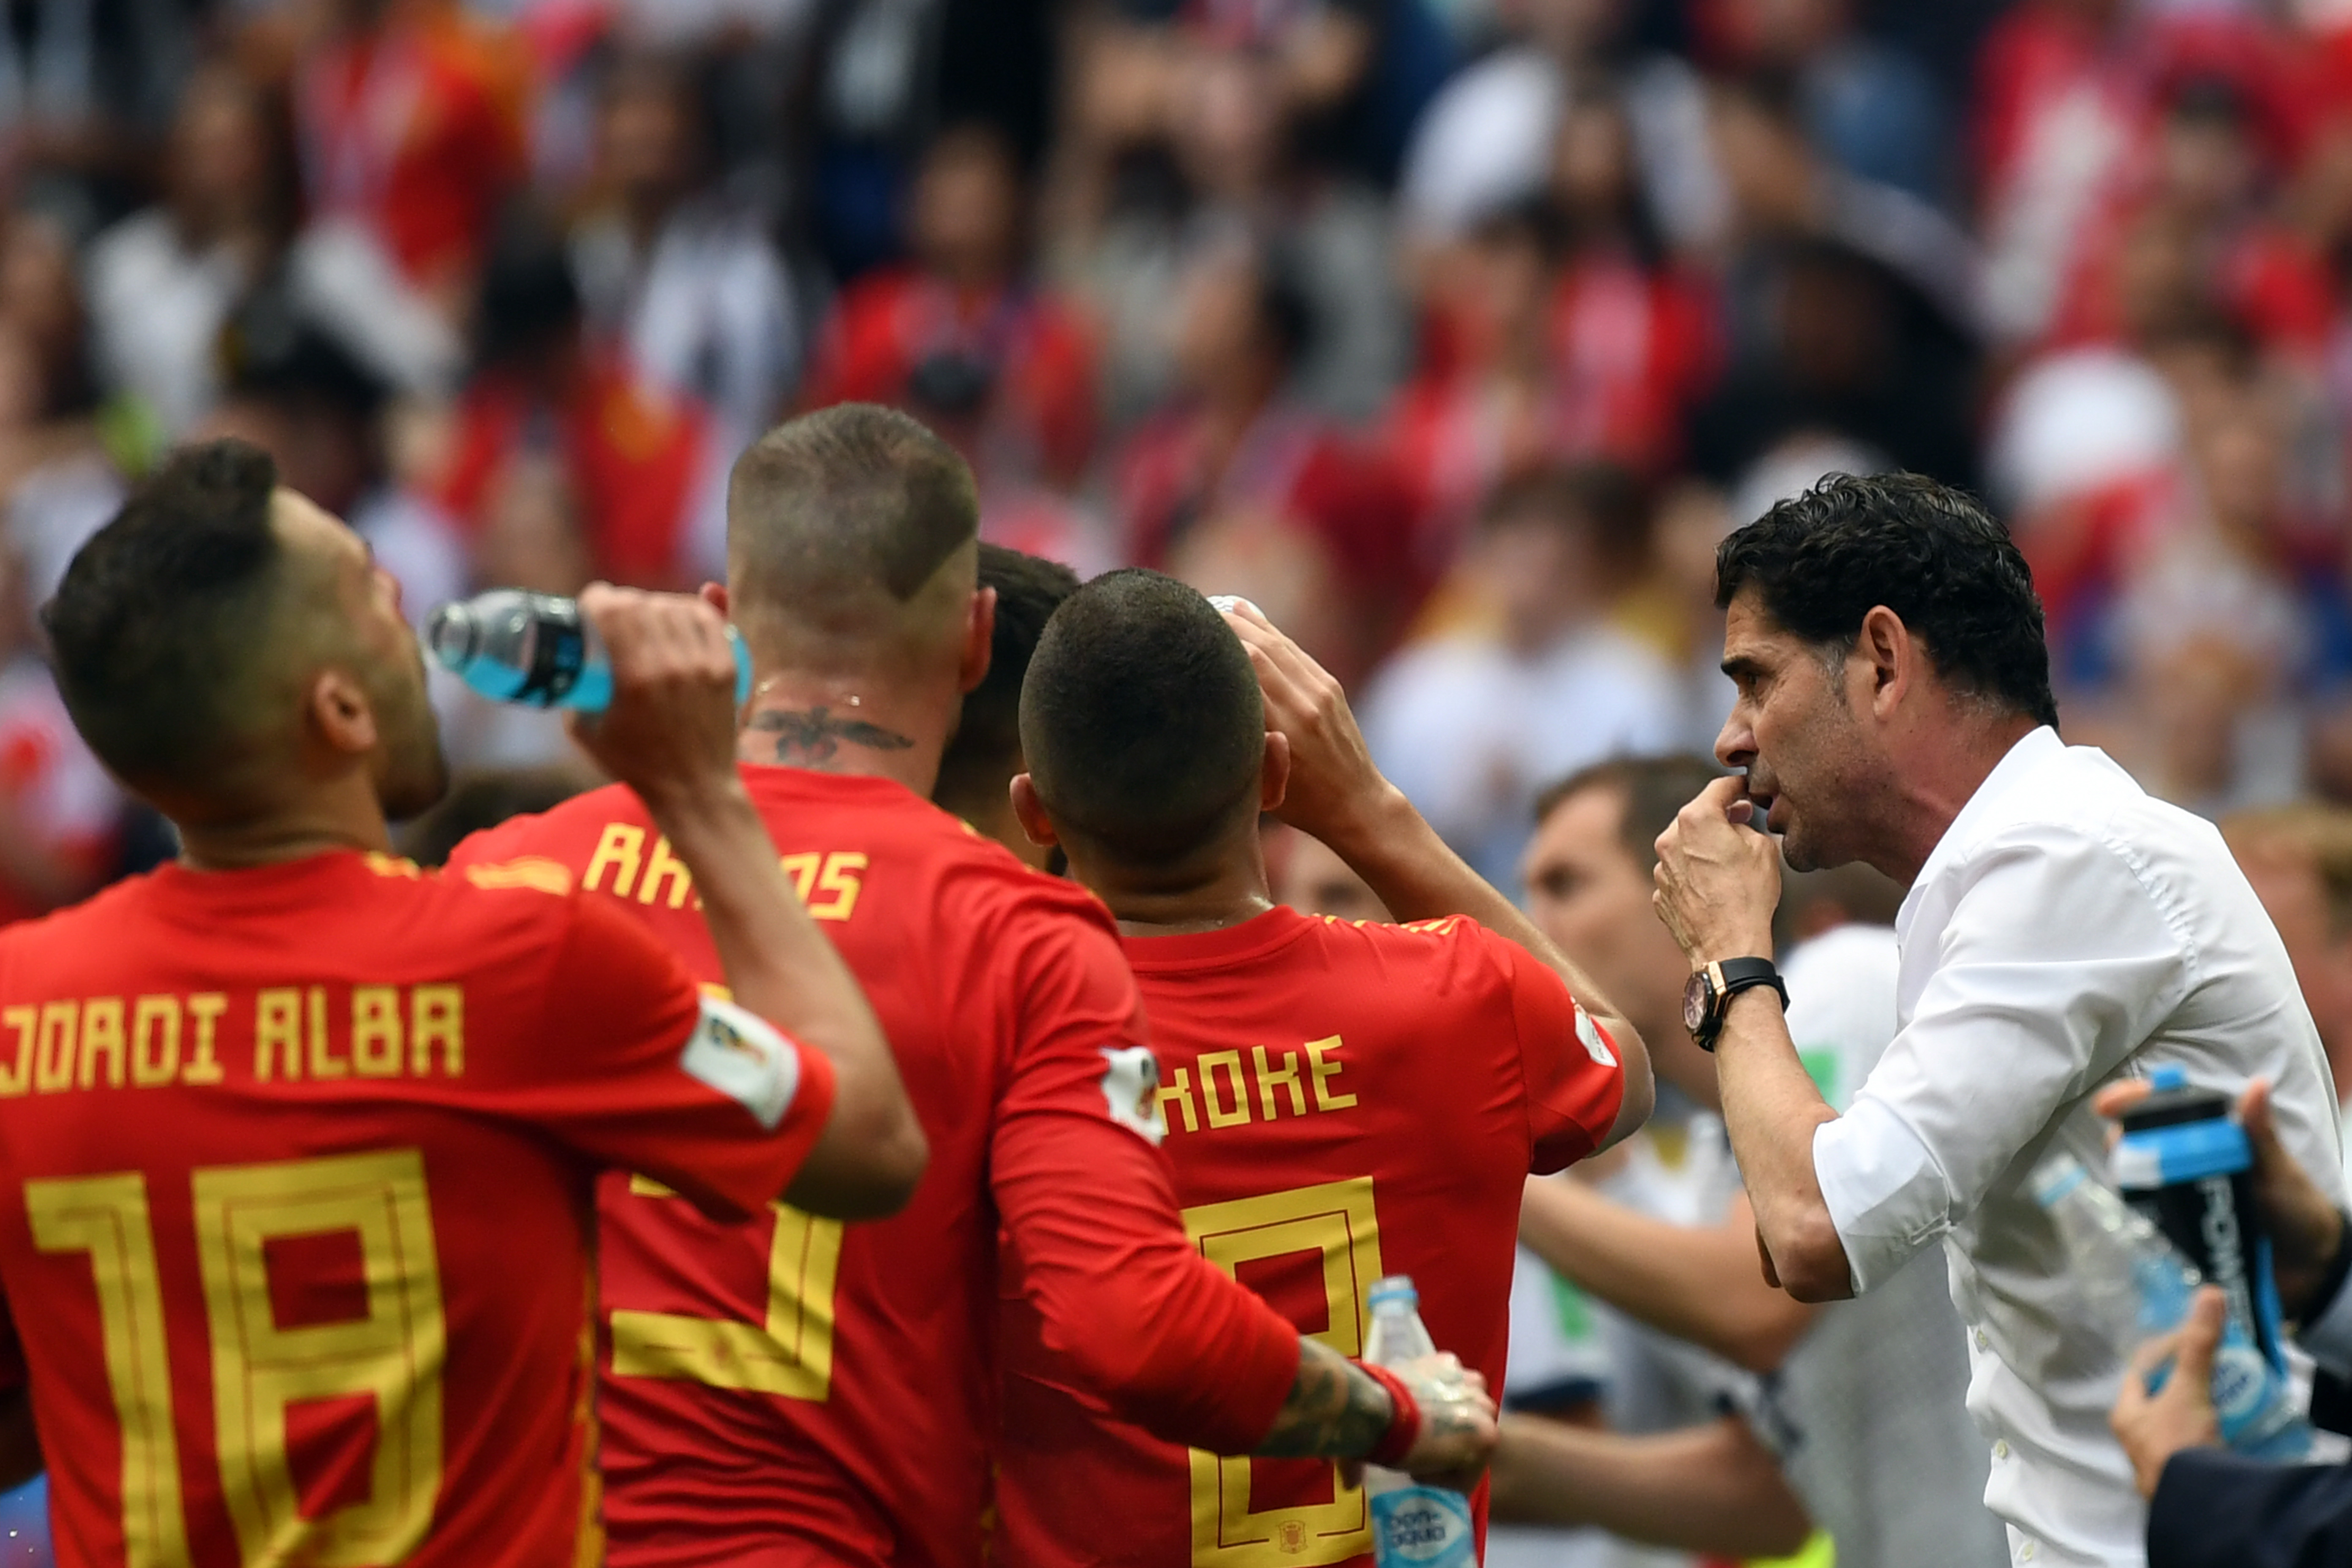 Jordi Alba Sergio Ramos Koke Fernando Hierro Spain Russia World Cup 07/01/18